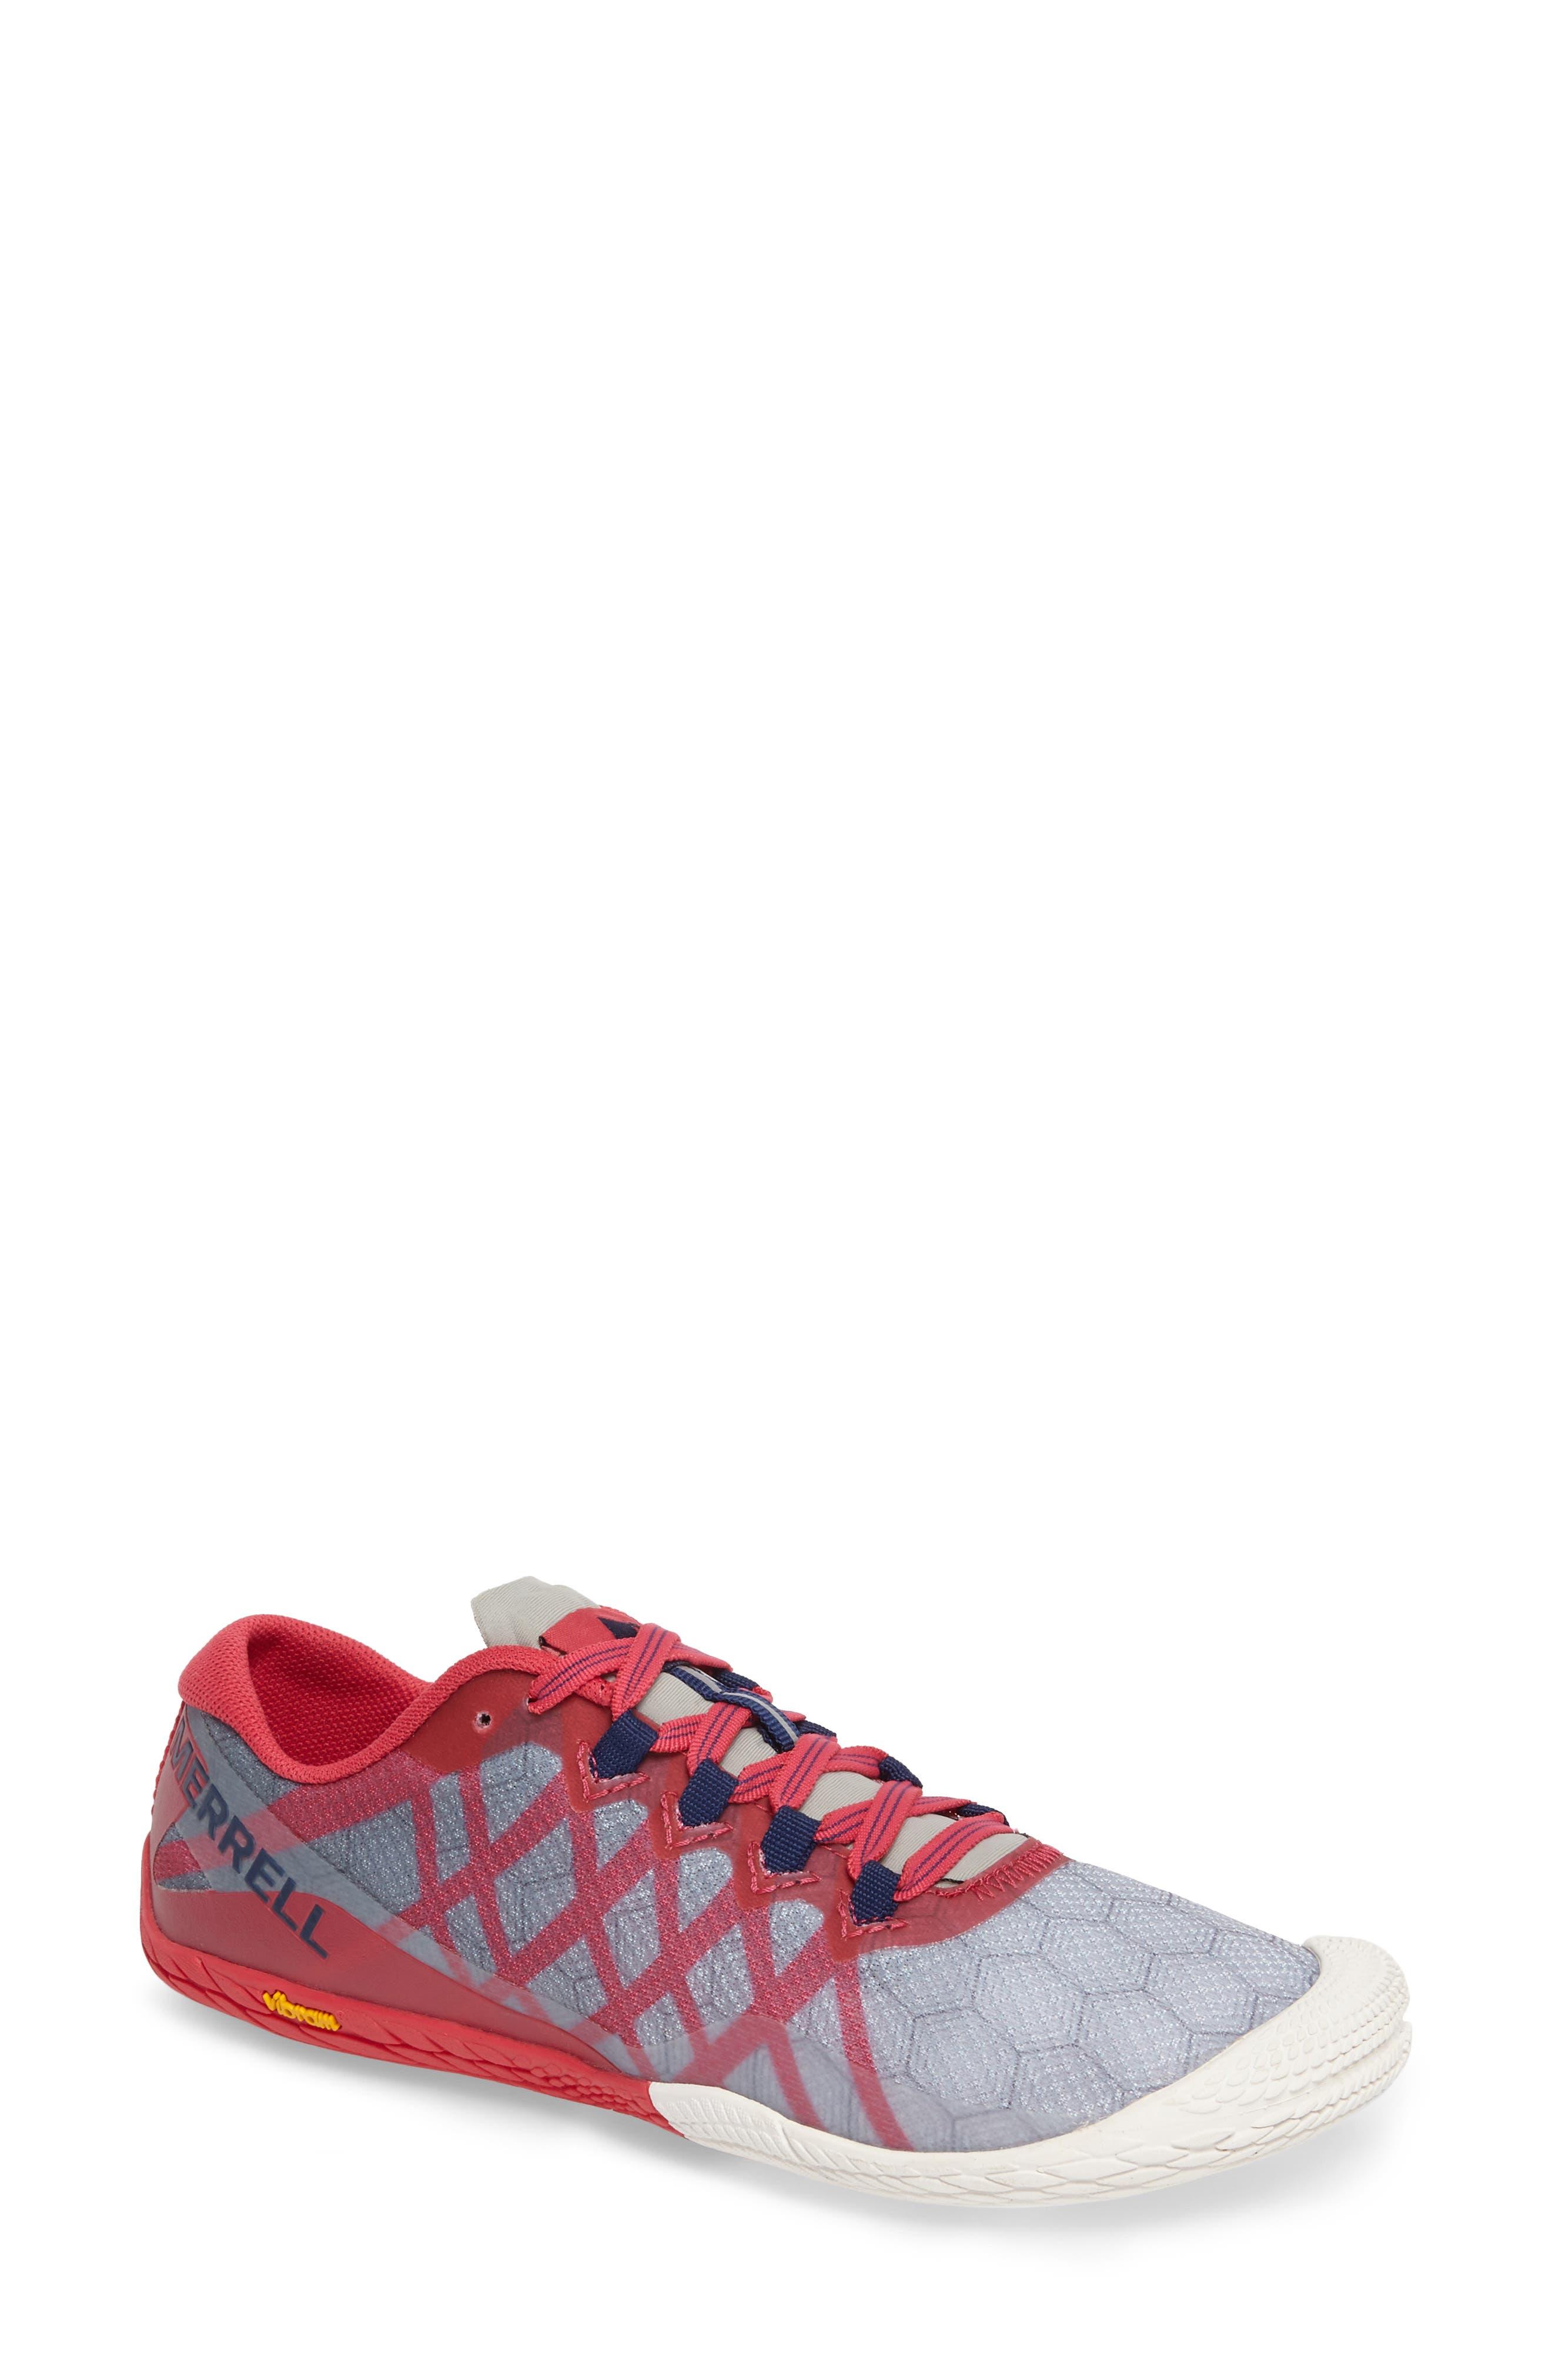 MERRELL Vapor Glove 3 Trail Running Shoe